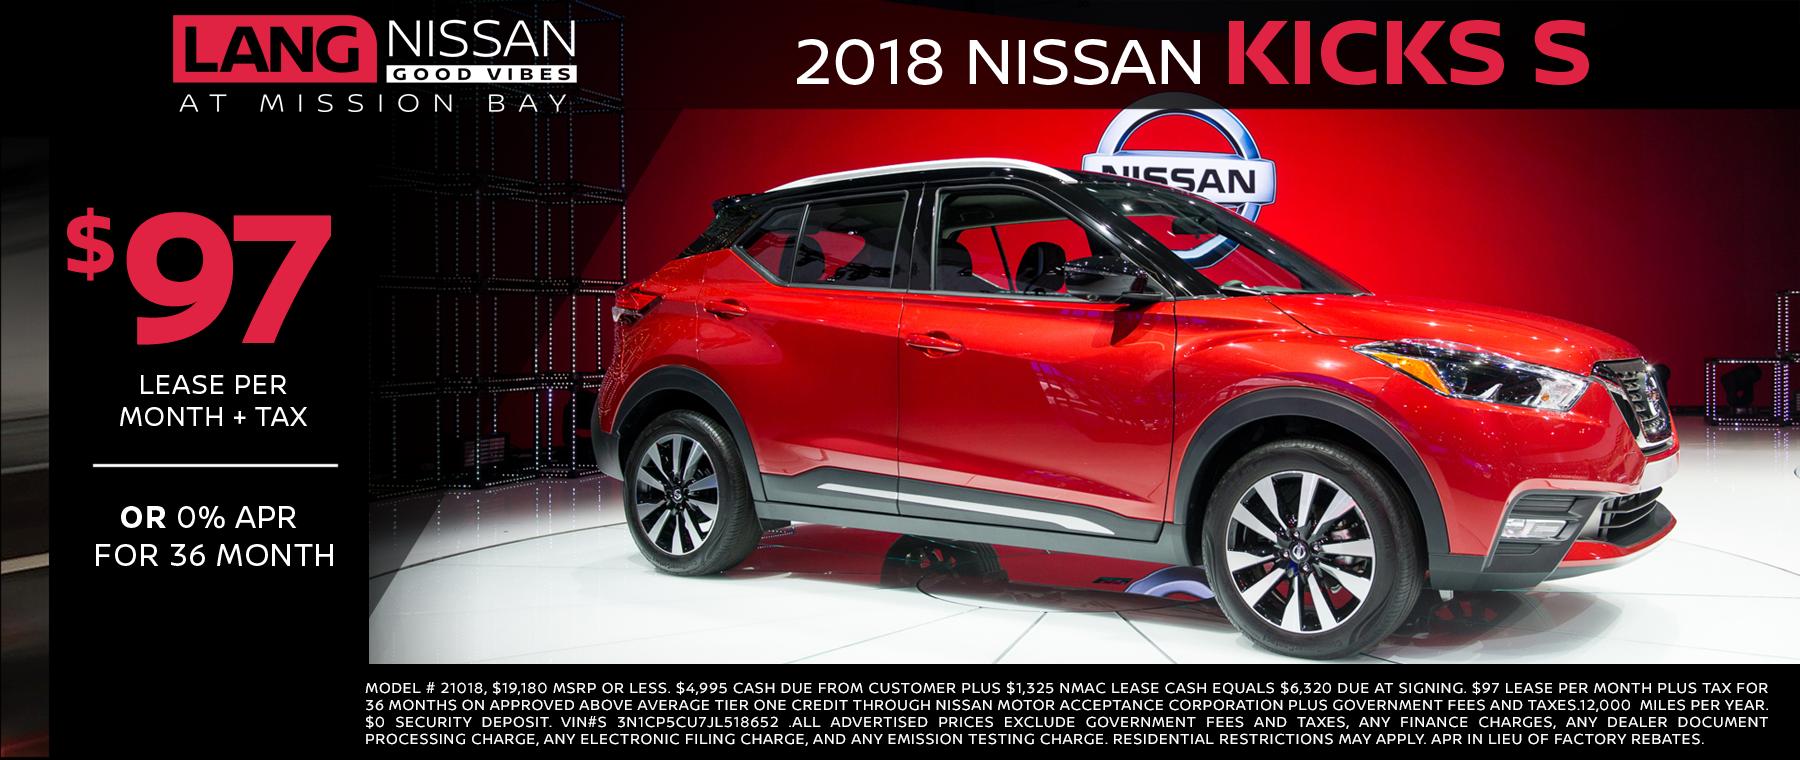 2018 Nissan Kicks Lease